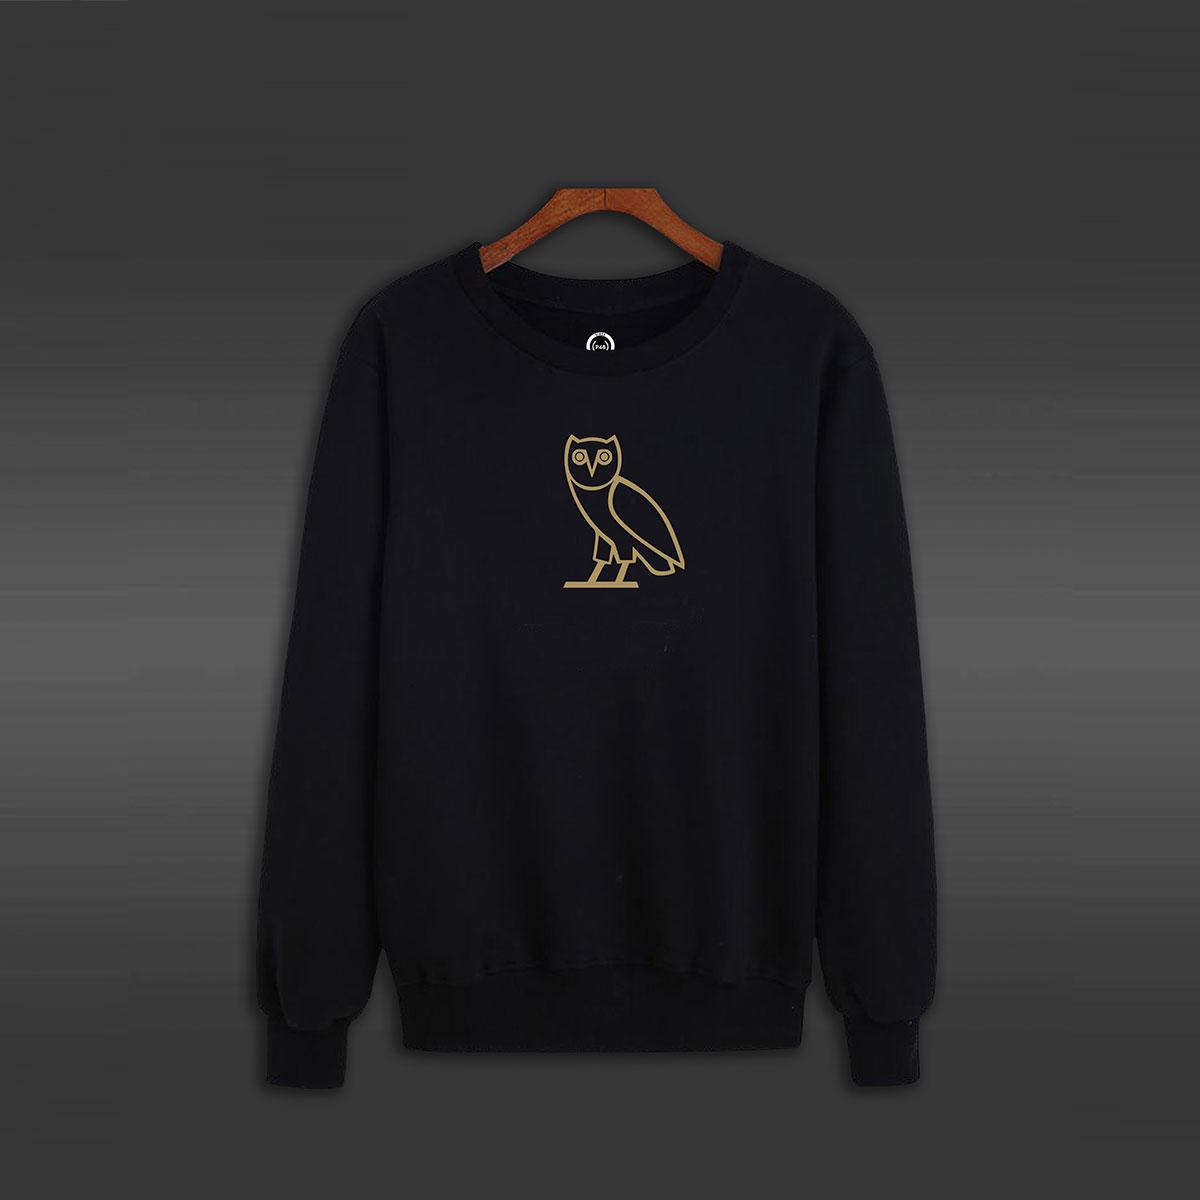 Golden Owl Crew Neck Sweater - Black